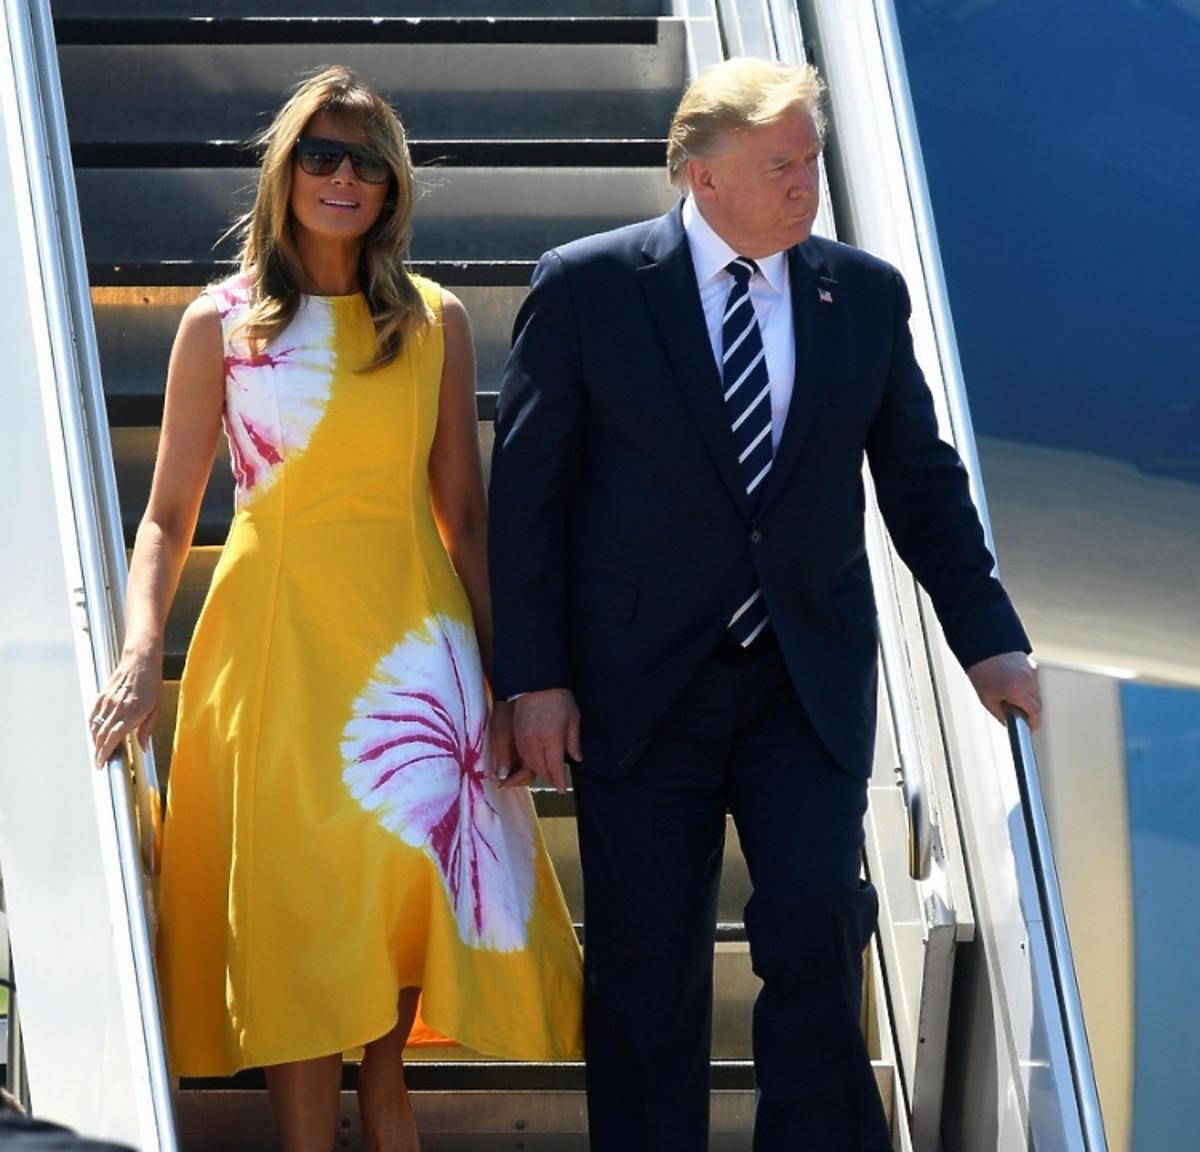 Melania Trump w żółtej sukience